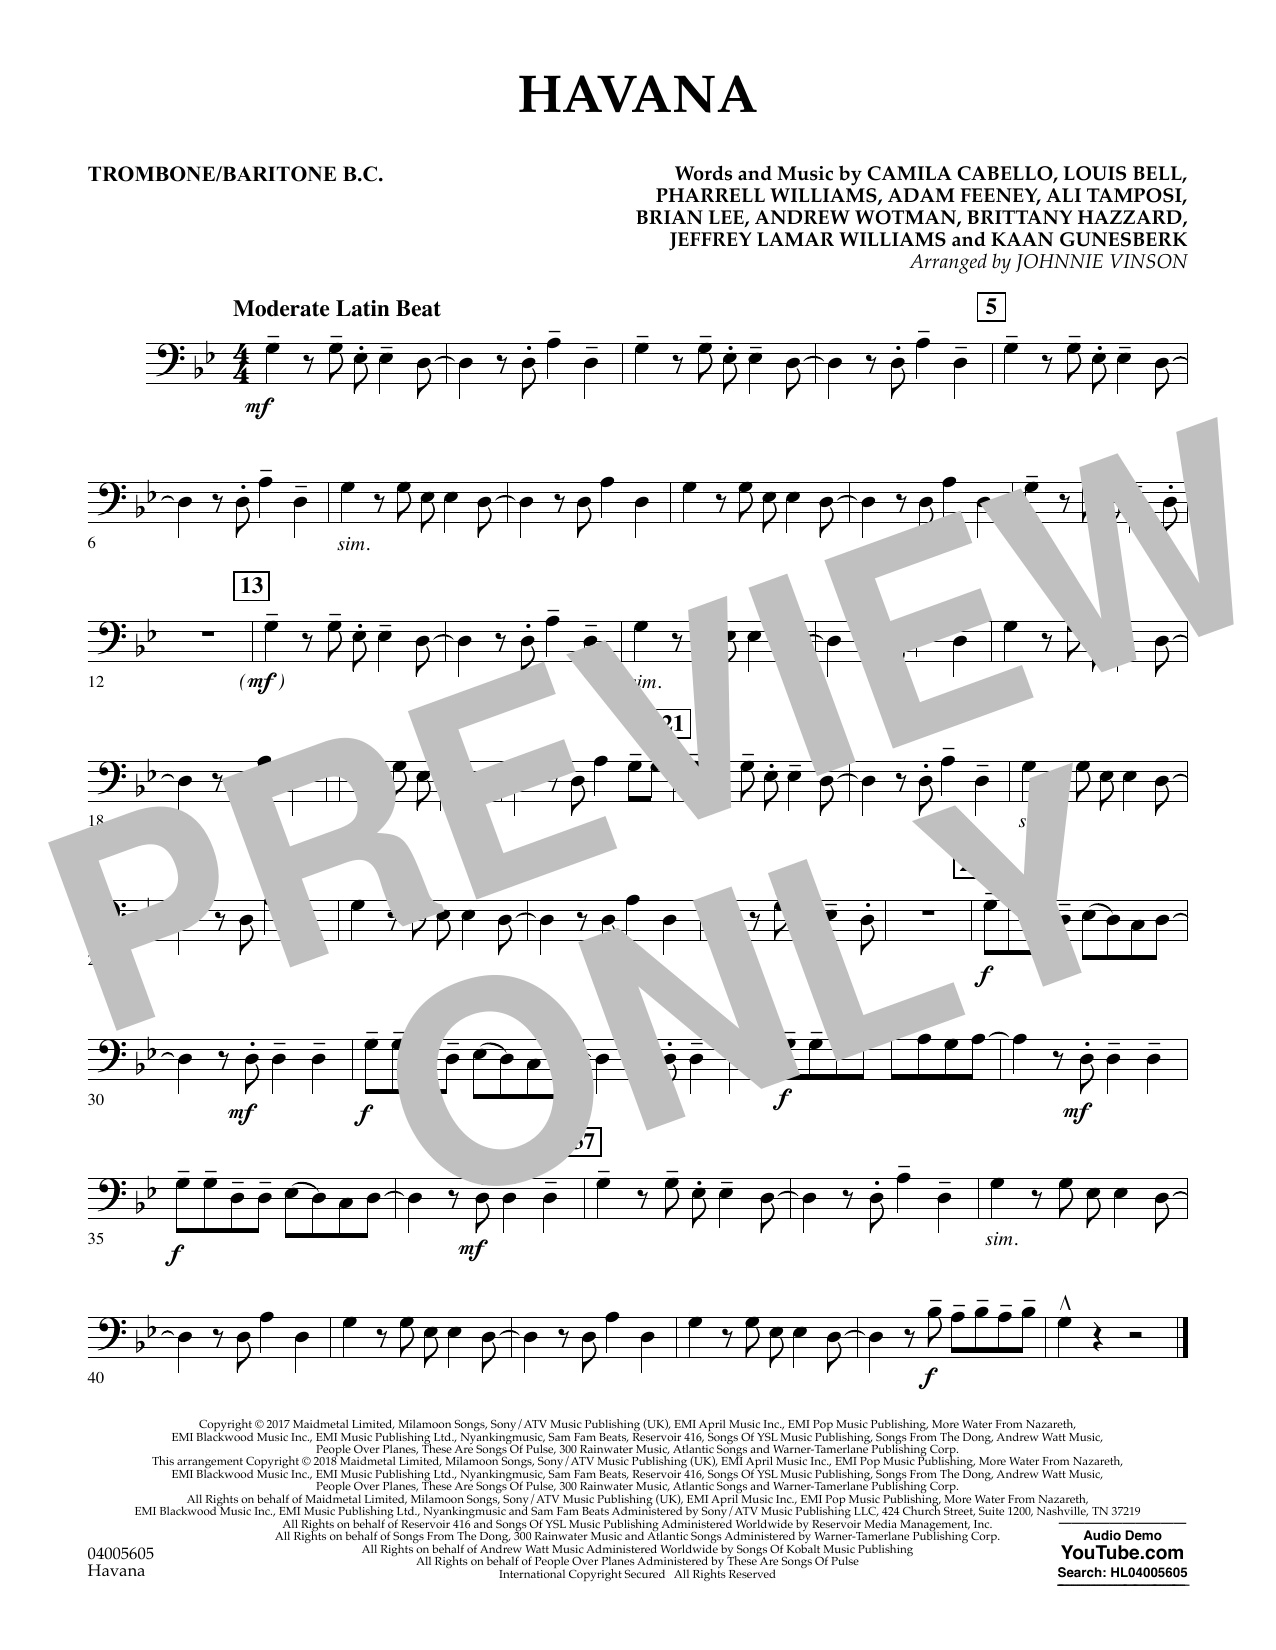 Johnnie Vinson Havana - Trombone/Baritone B.C. sheet music notes and chords. Download Printable PDF.